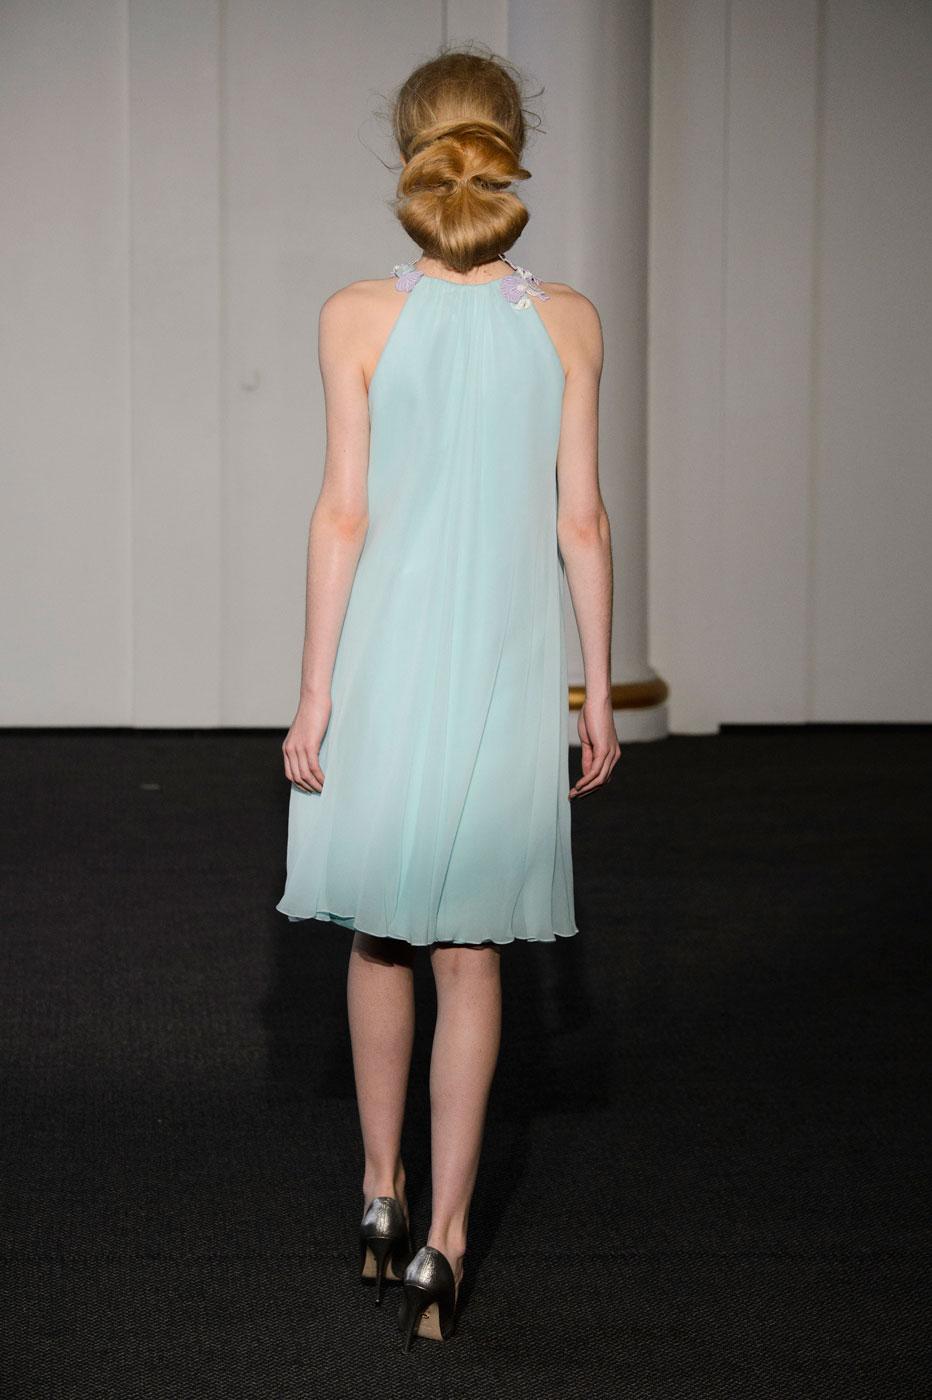 Busardi-fashion-runway-show-haute-couture-paris-spring-2015-the-impression-12